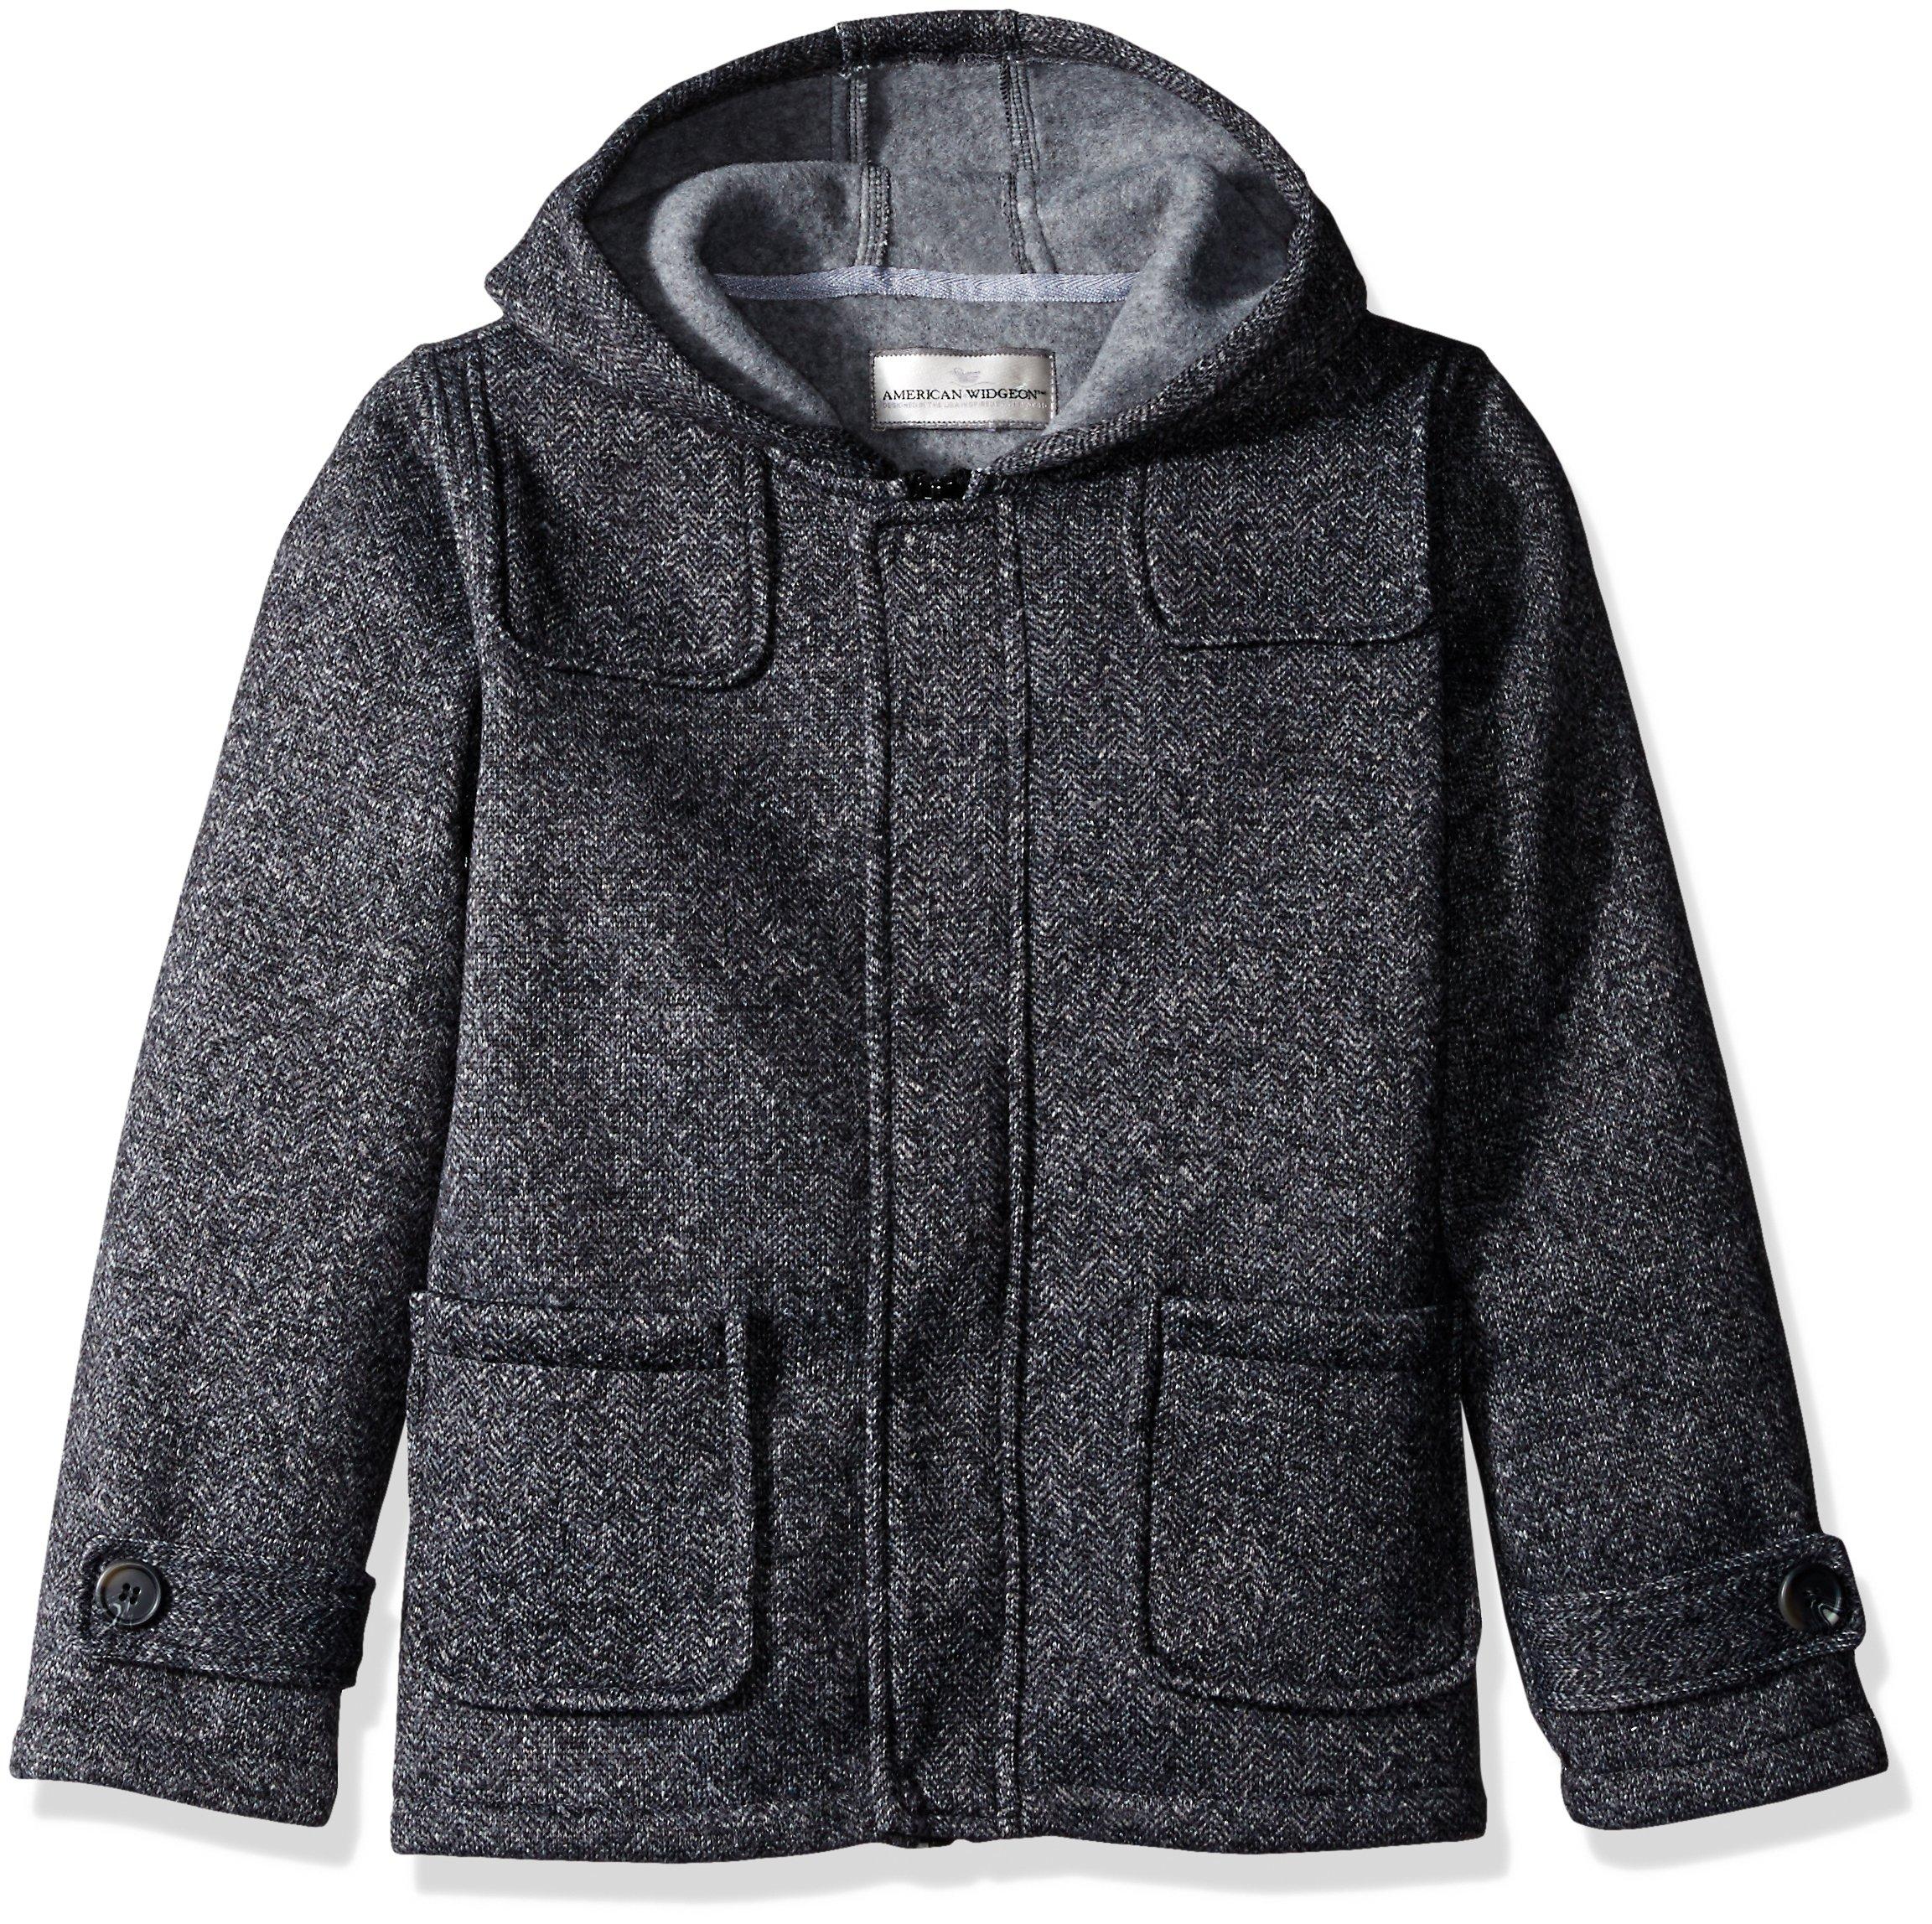 Widgeon Boys' Big Fleece Heather Tweedy Coat, Grey, 10